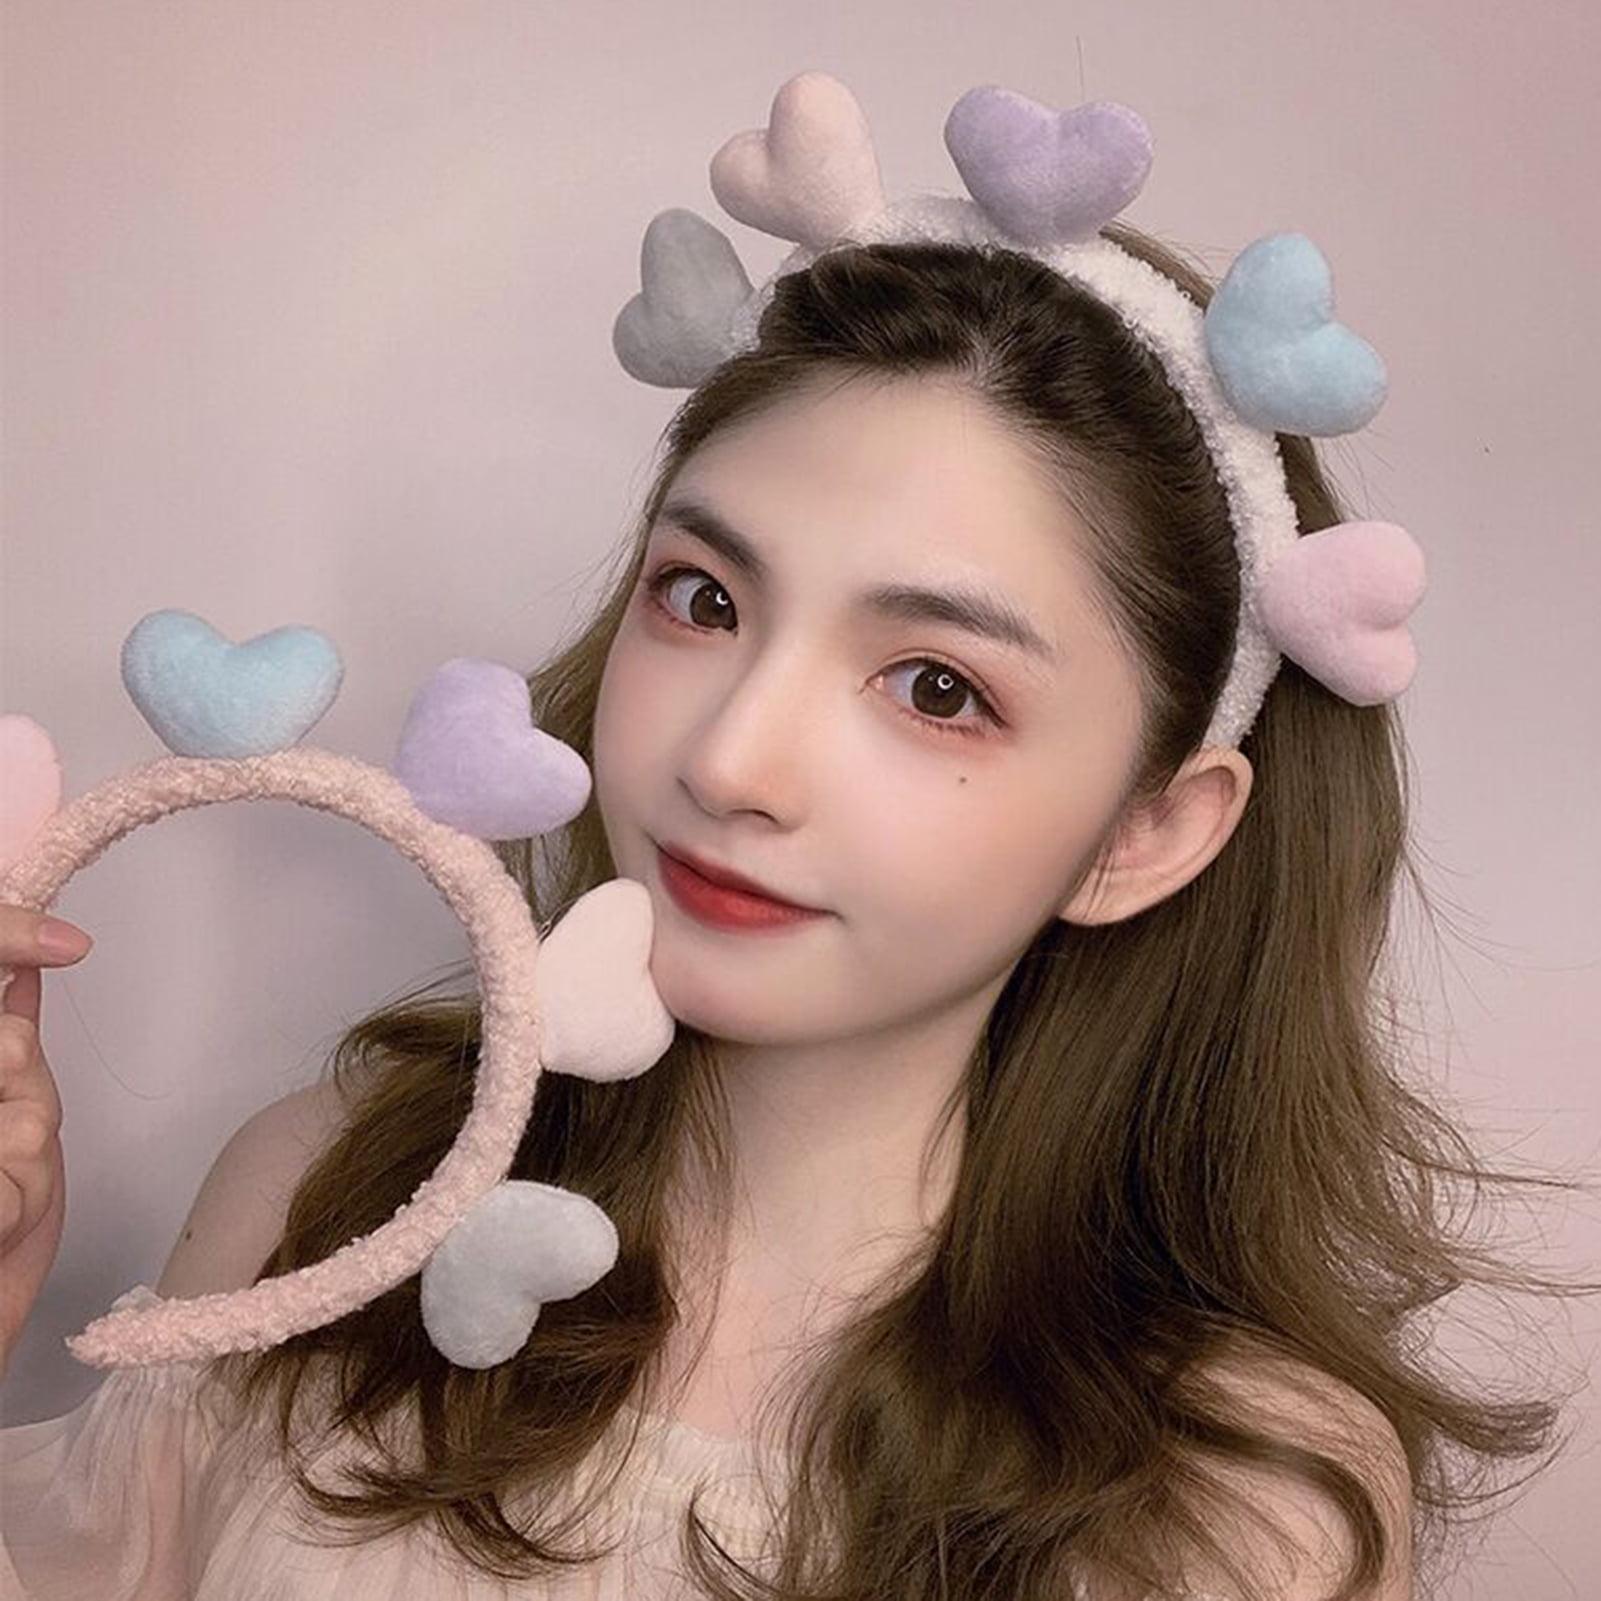 Details about  /Women/'s Cute Hairband Christmas Headband Kids Hair Hoop Band Hair Accessories